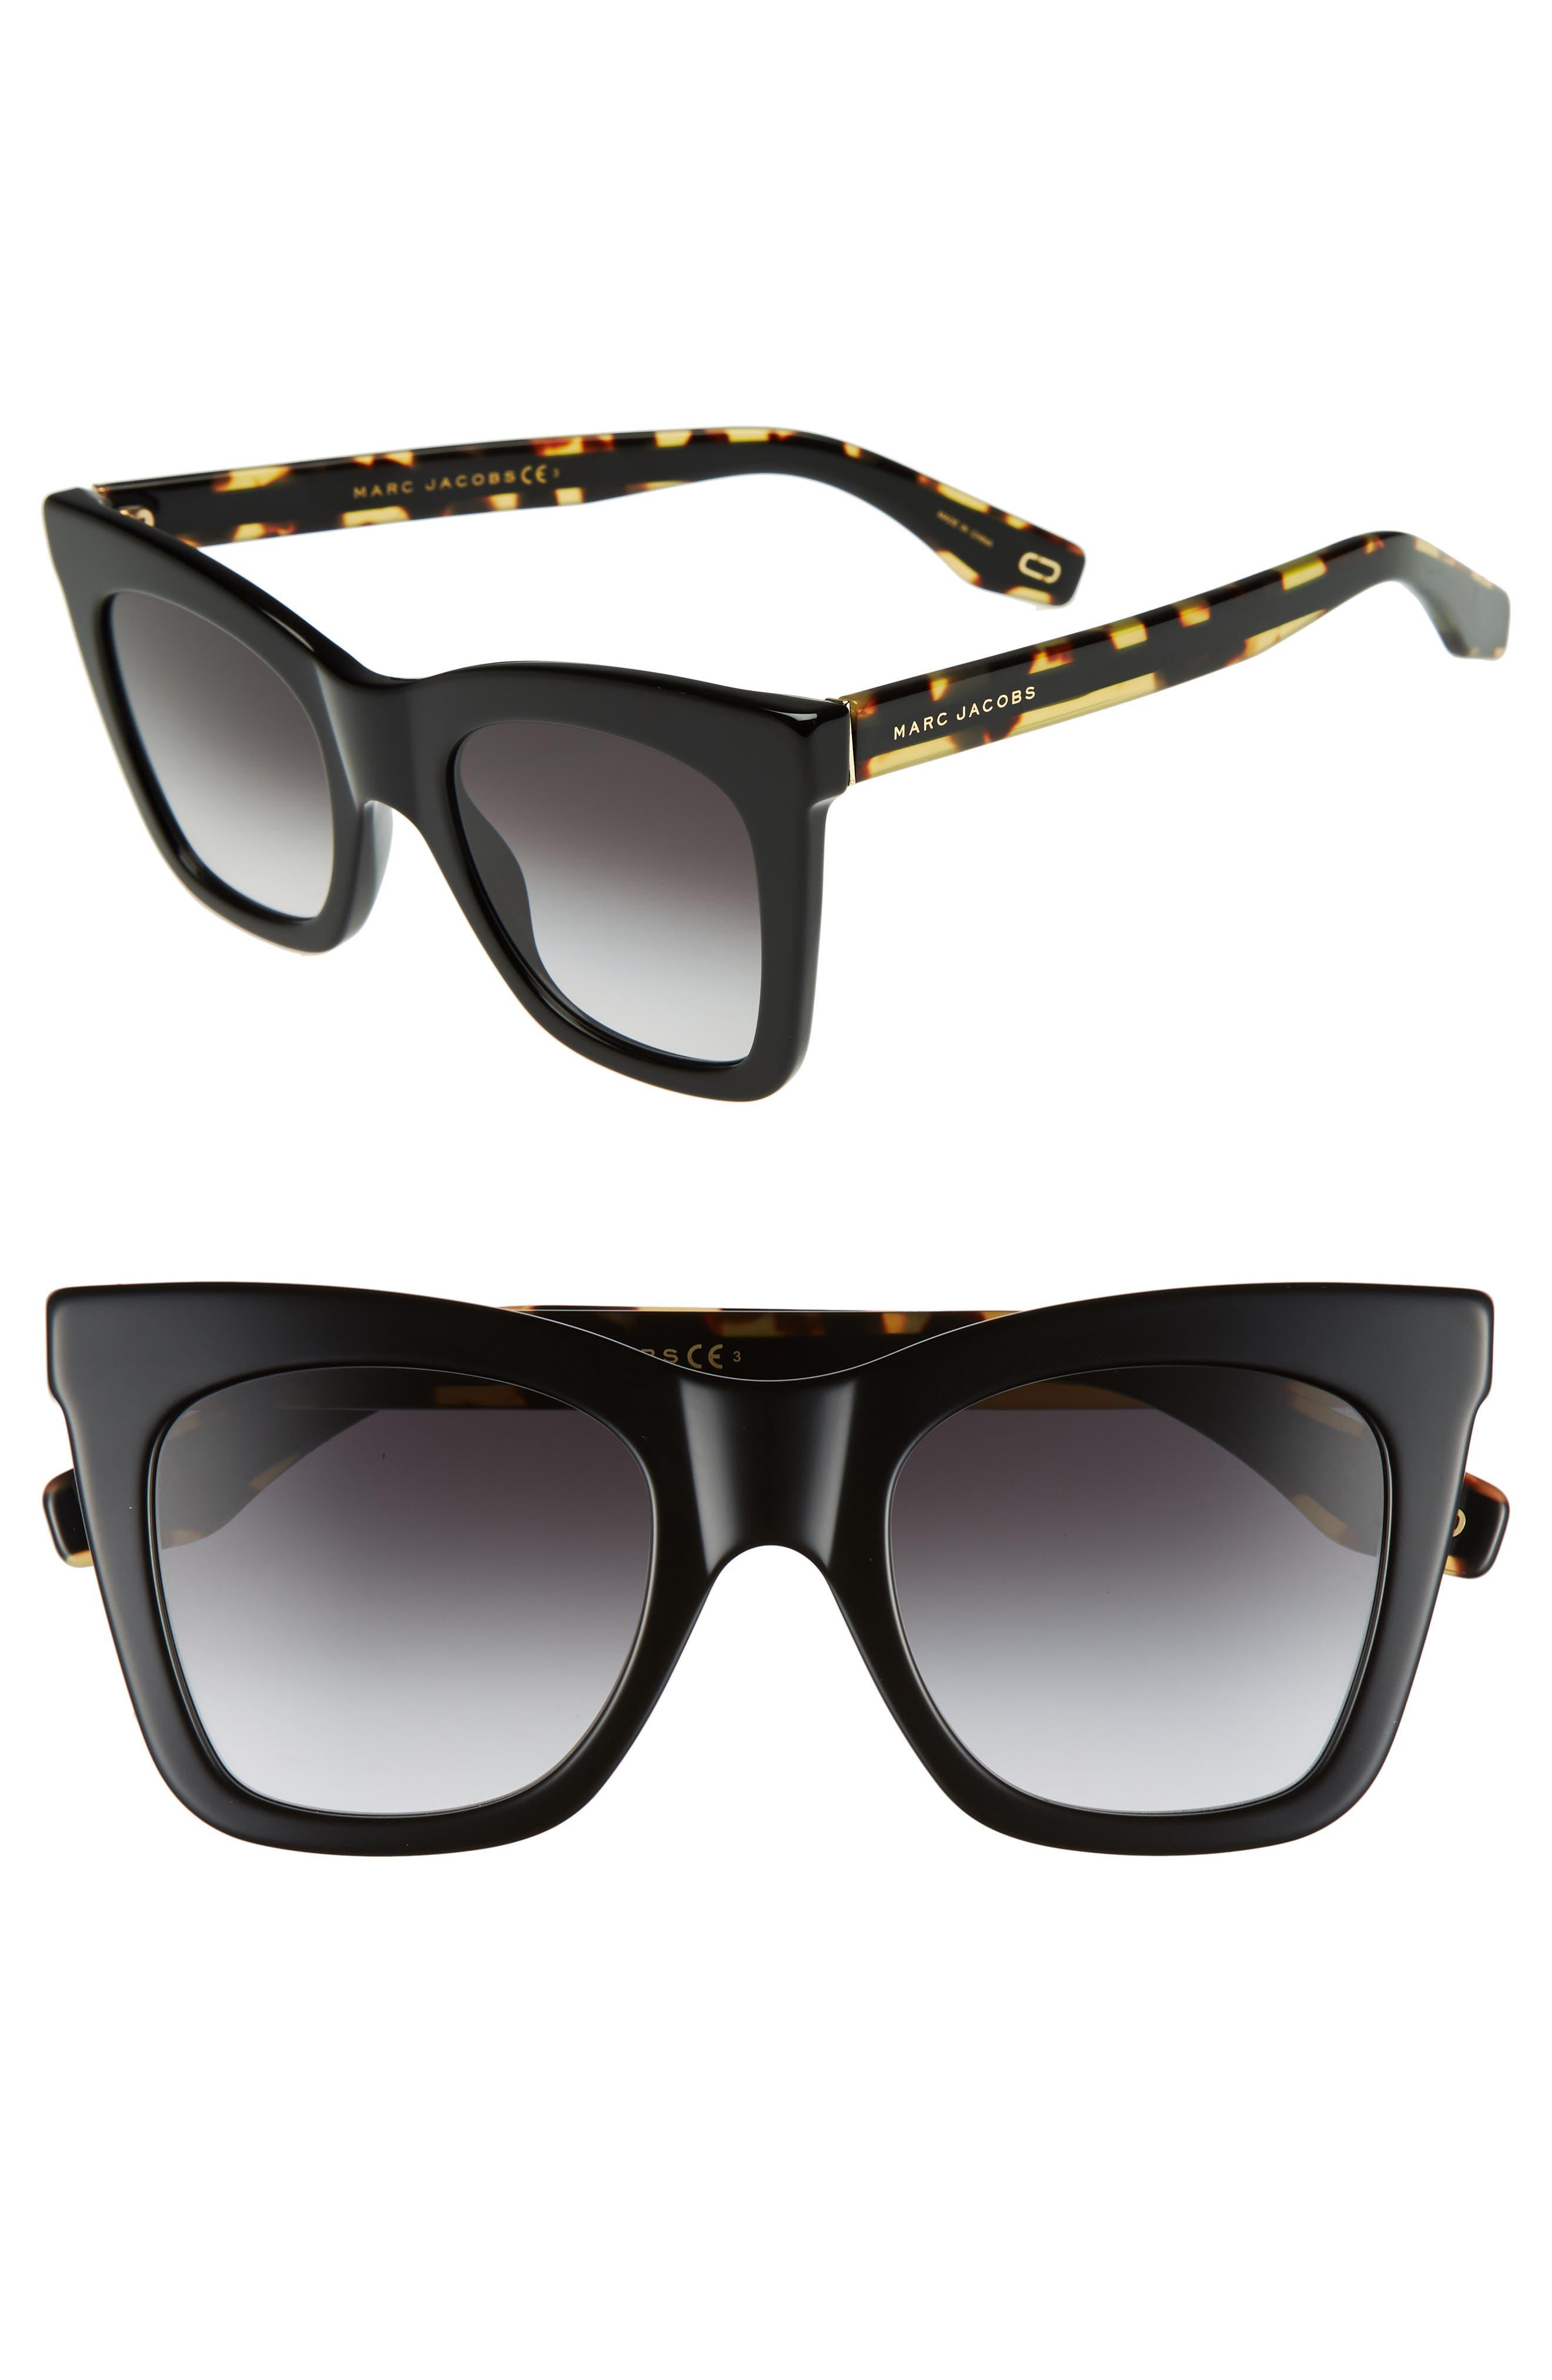 50mm Cat Eye Sunglasses,                             Main thumbnail 1, color,                             BLACK